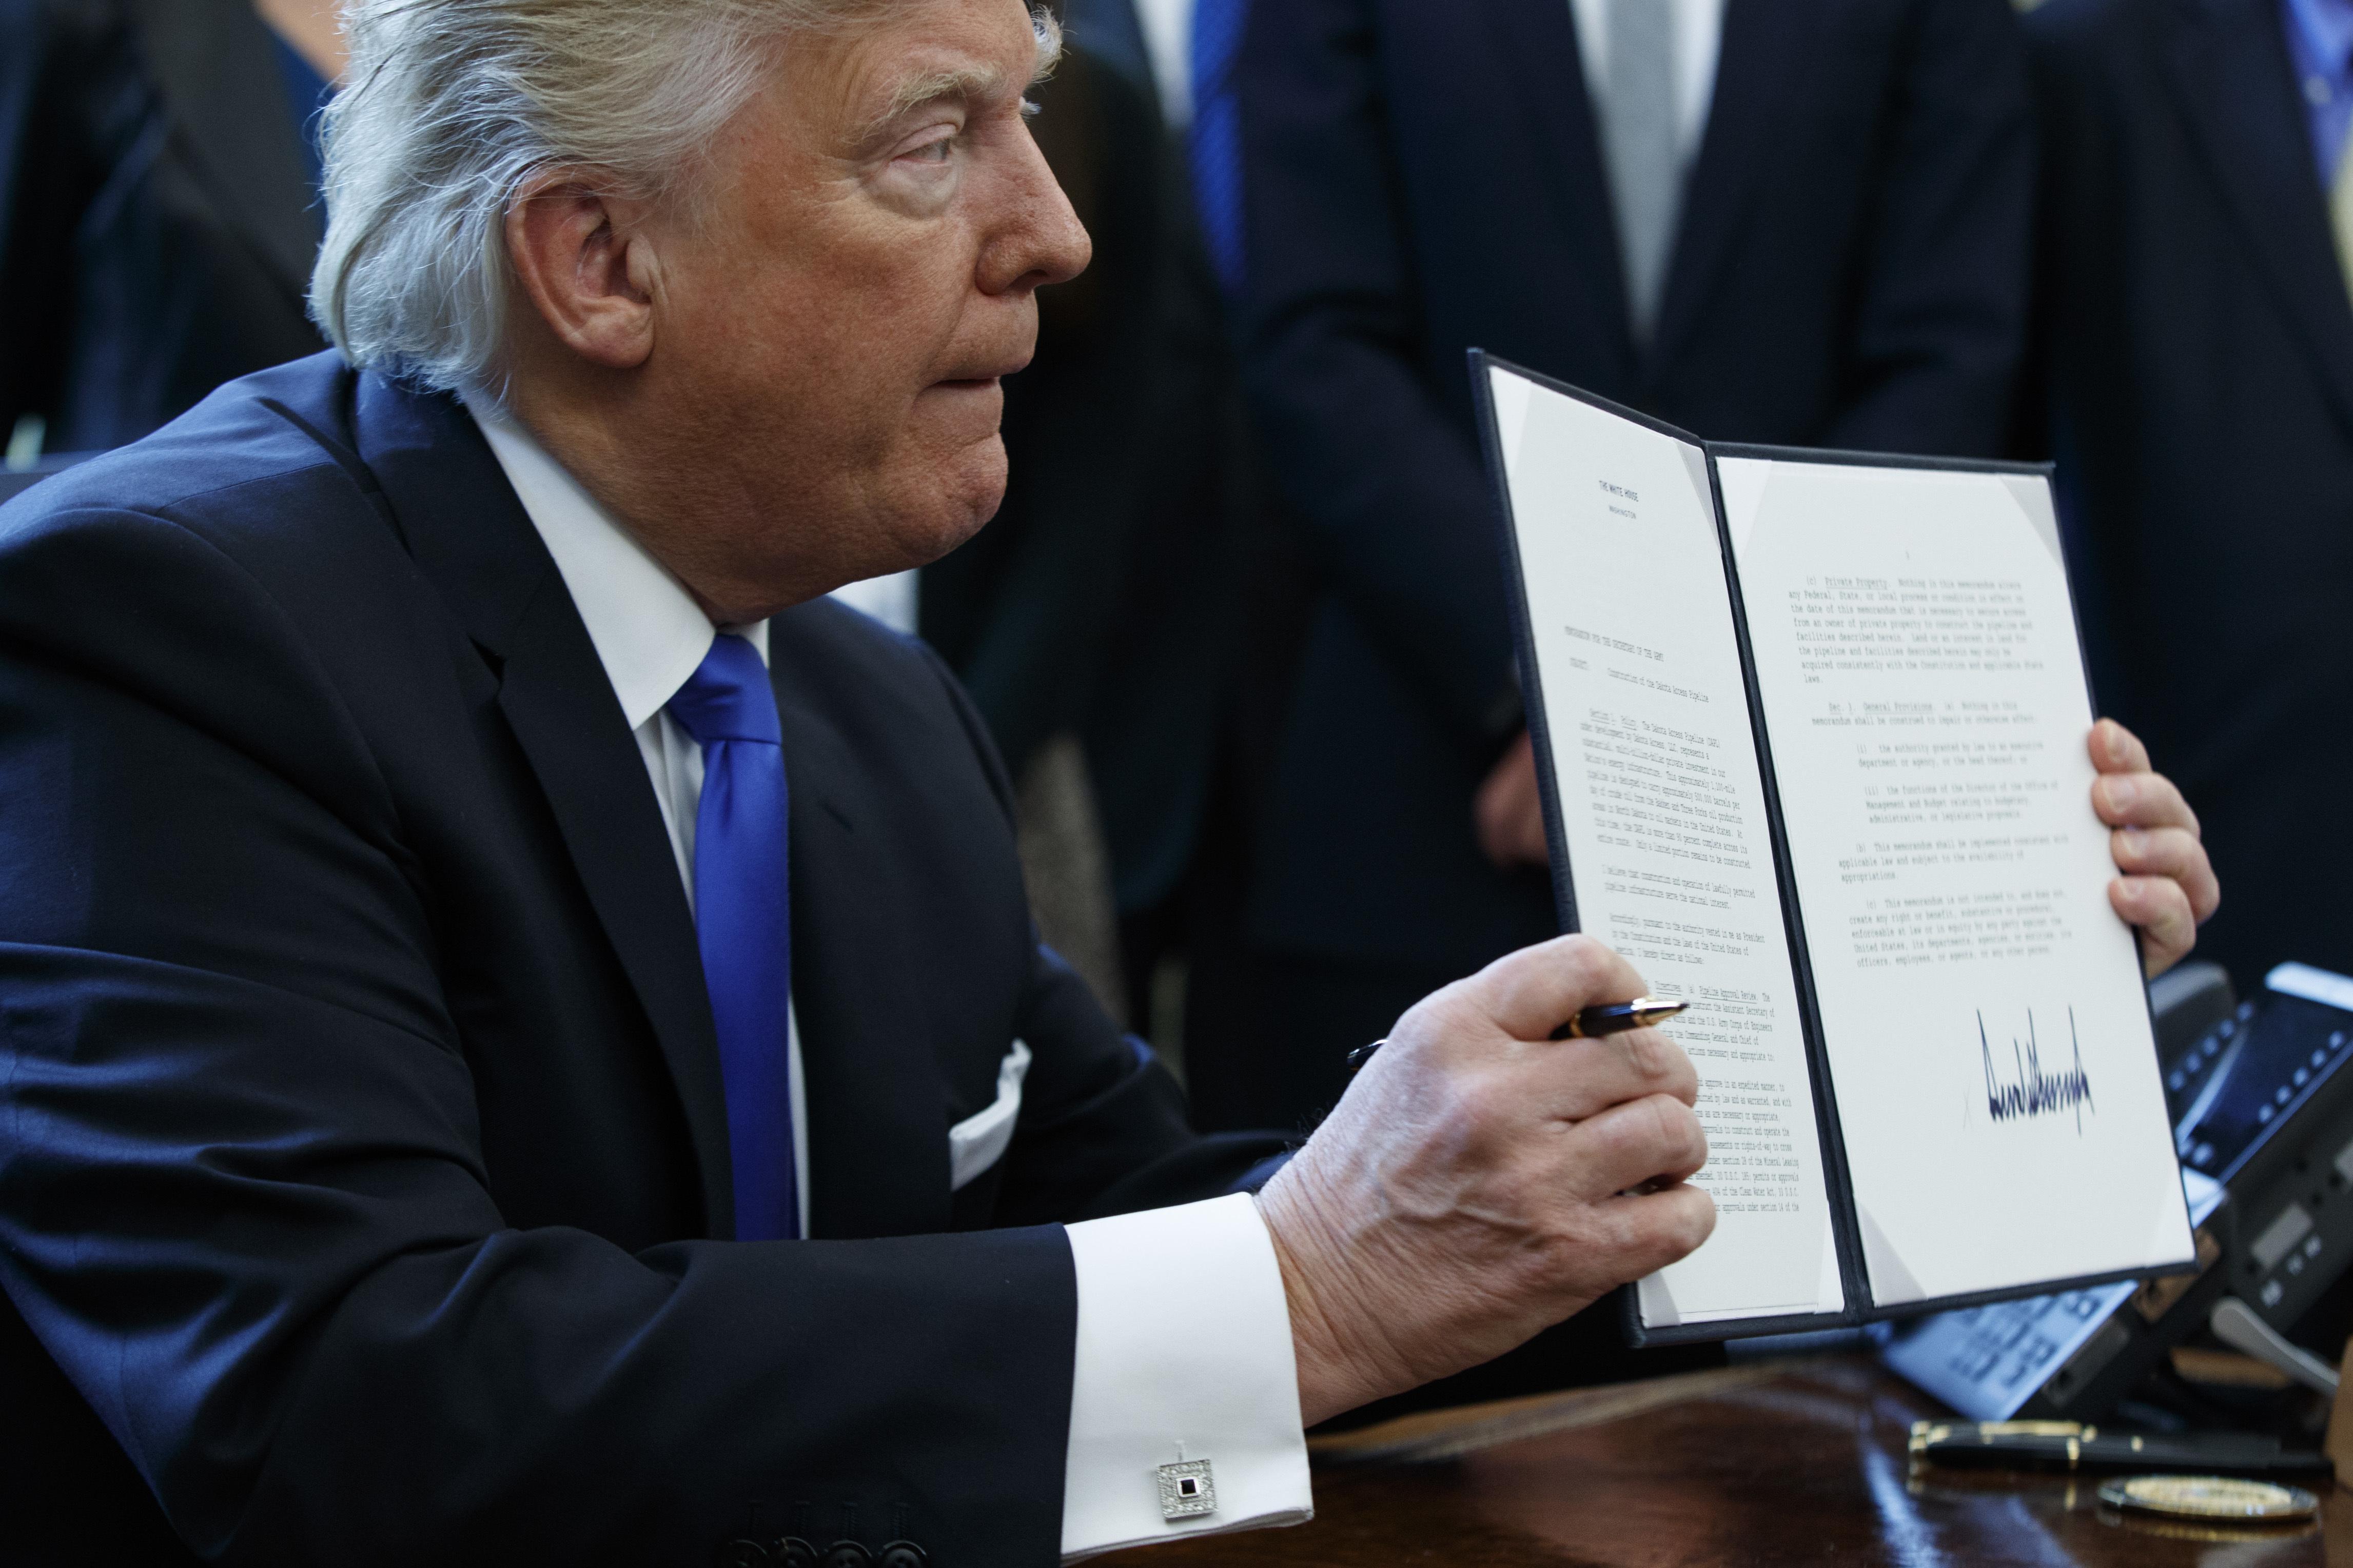 Donald Trump -- full steam ahead